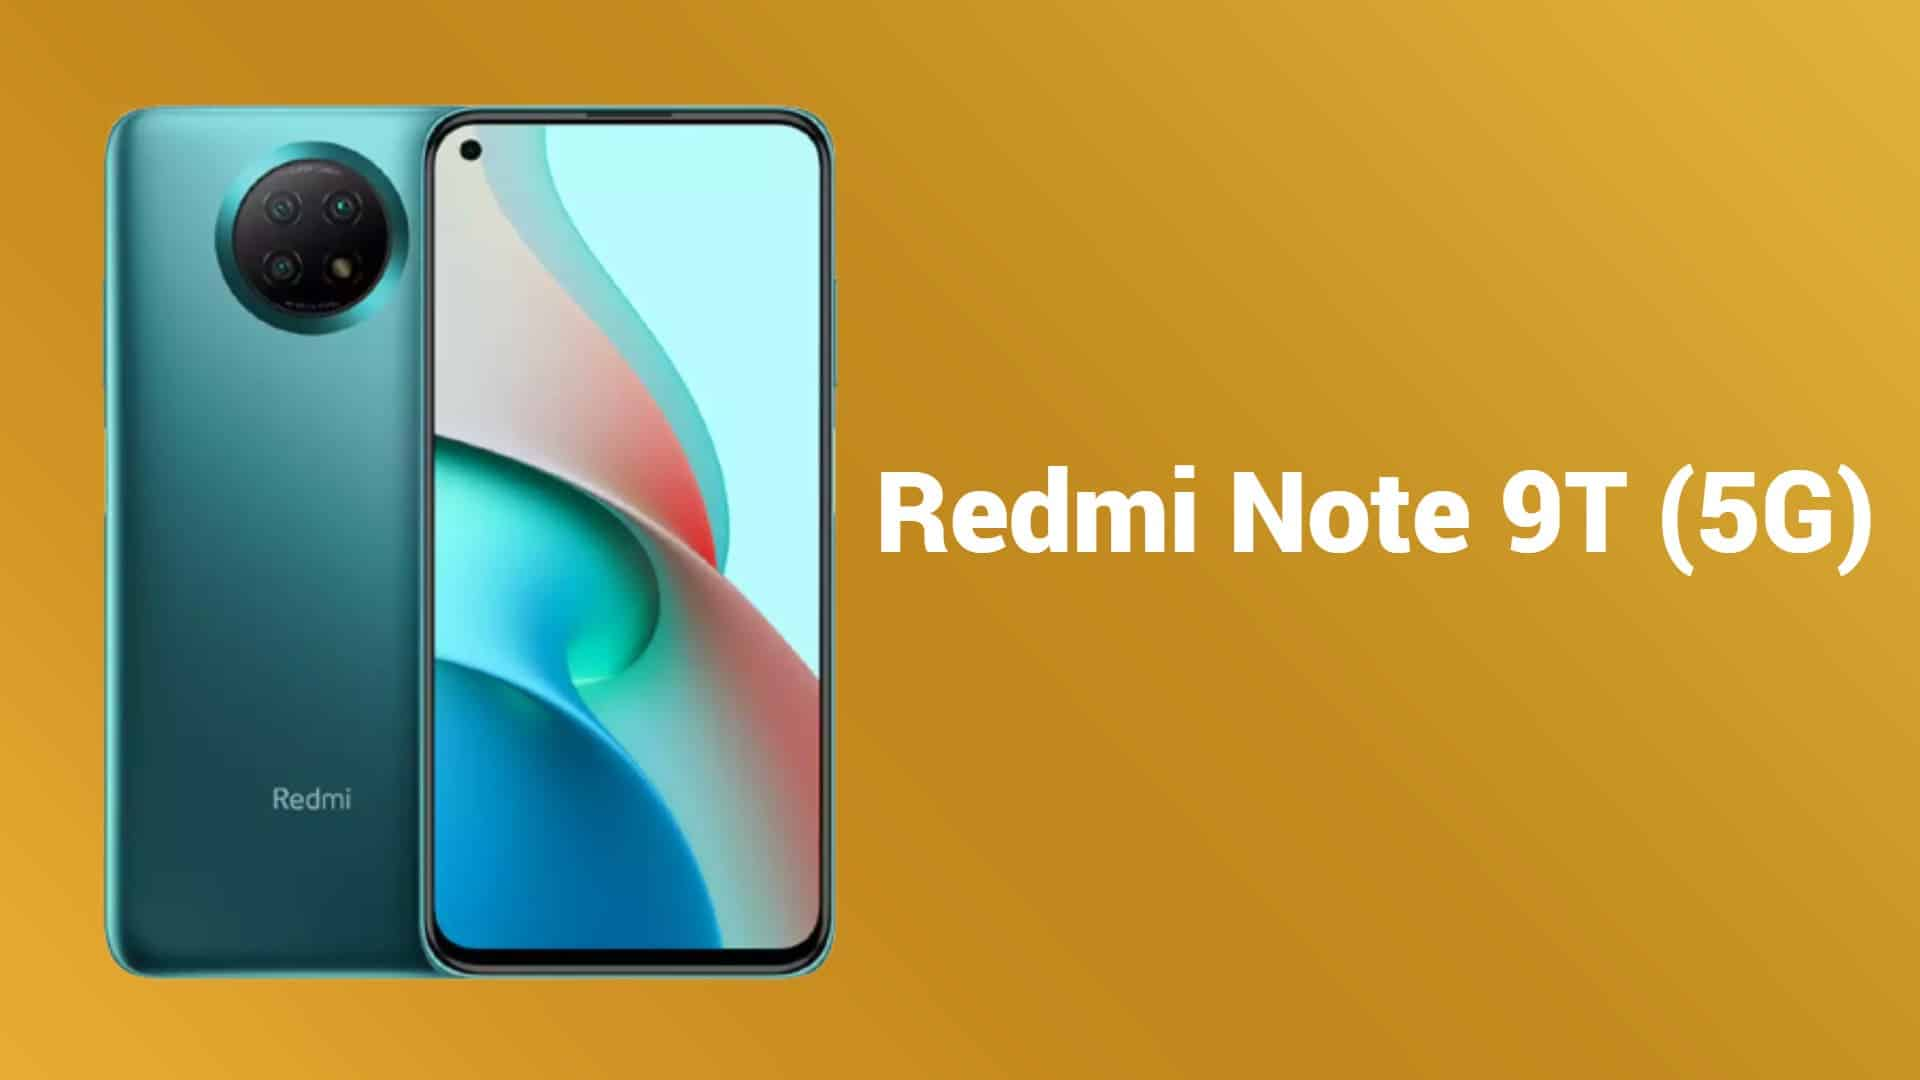 Redmi Note 9T with MediaTek Dimensity 800U spotted on Geekbench